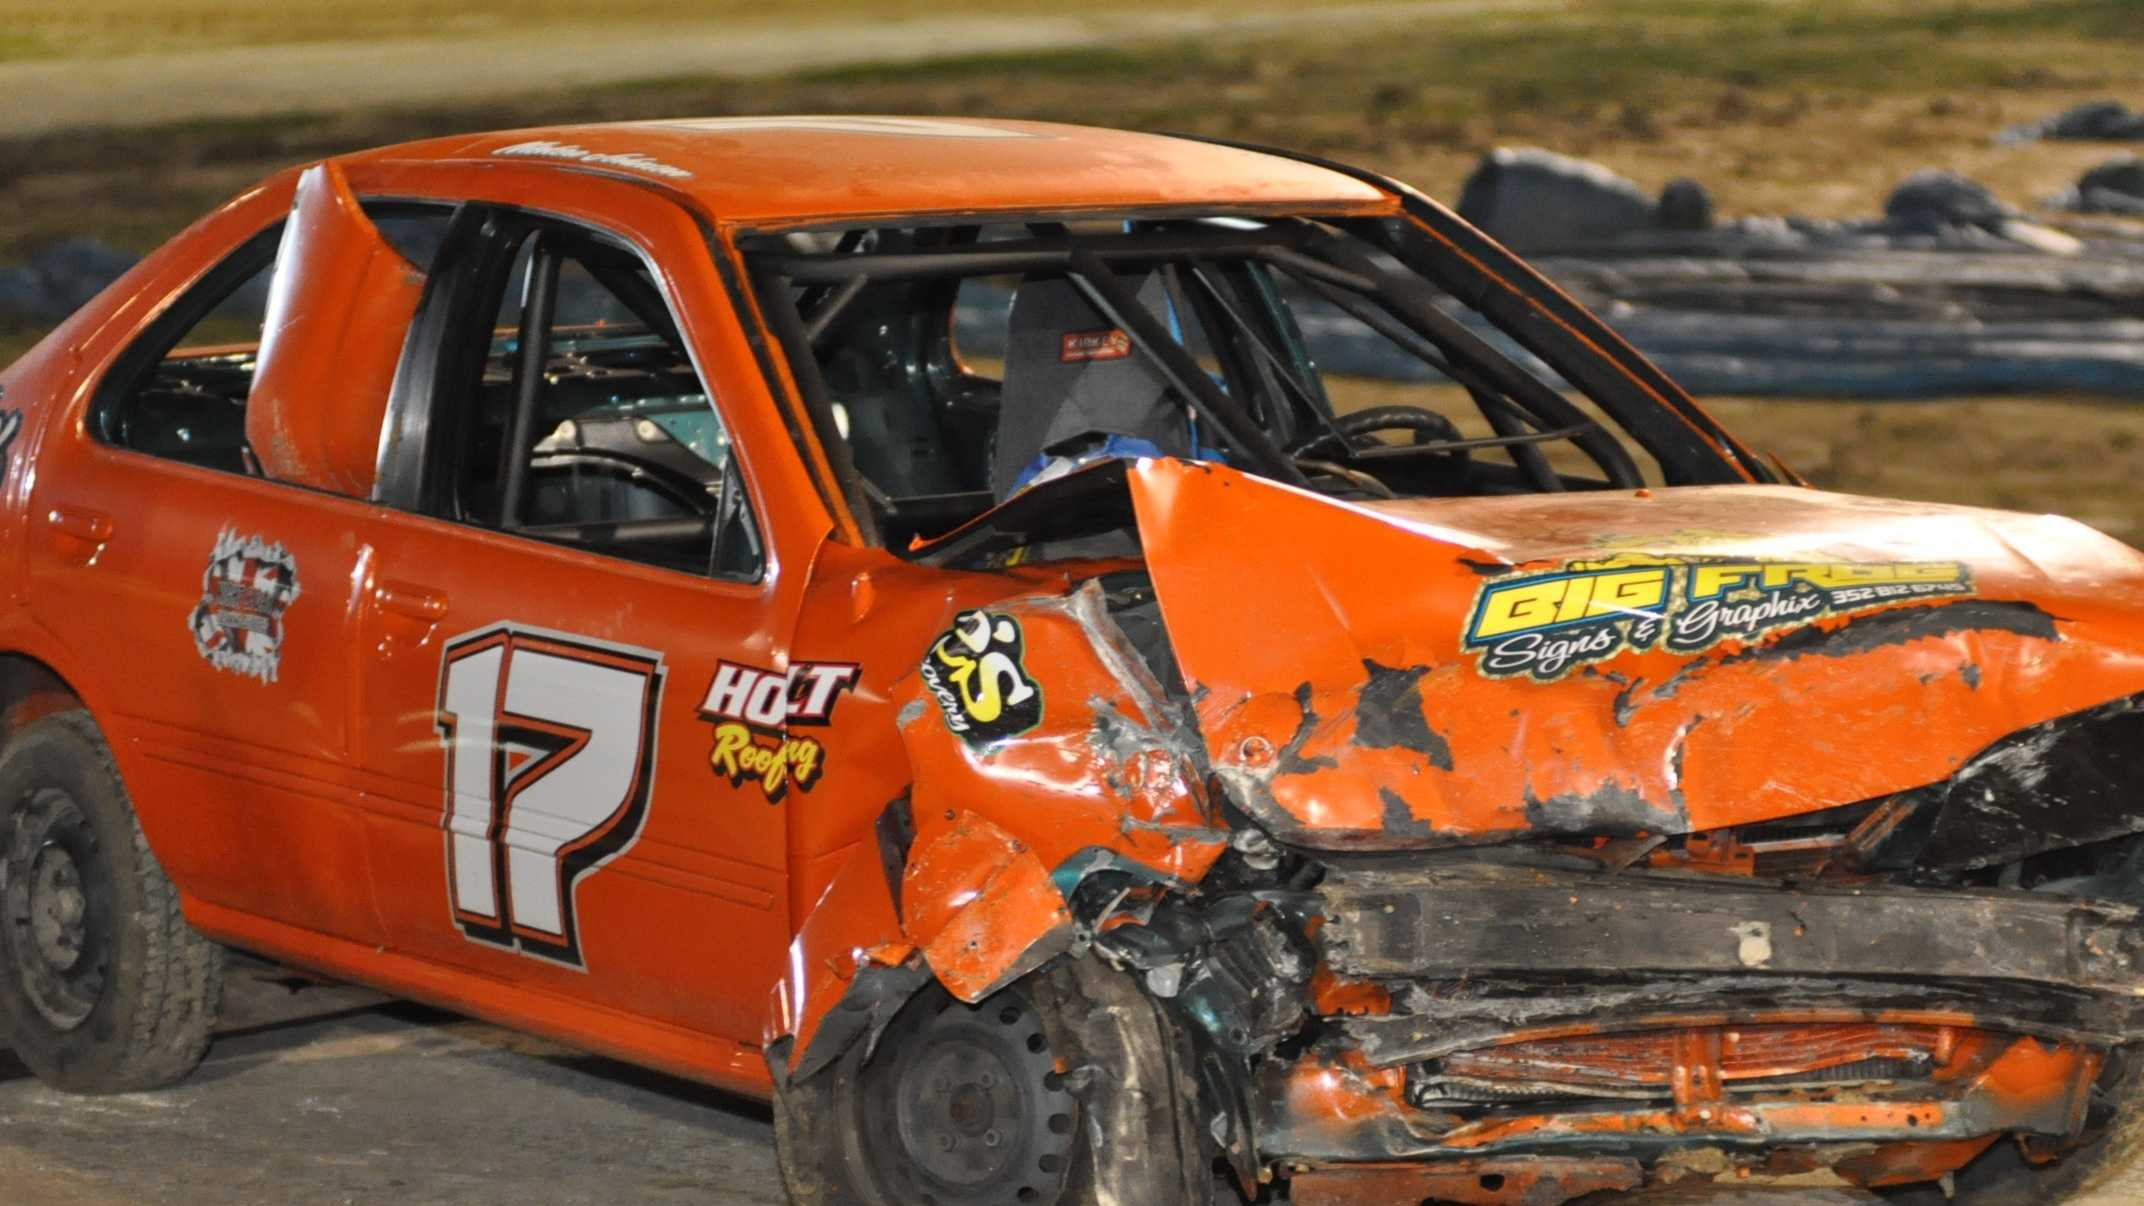 Teenager dies after suffering injuries in crash